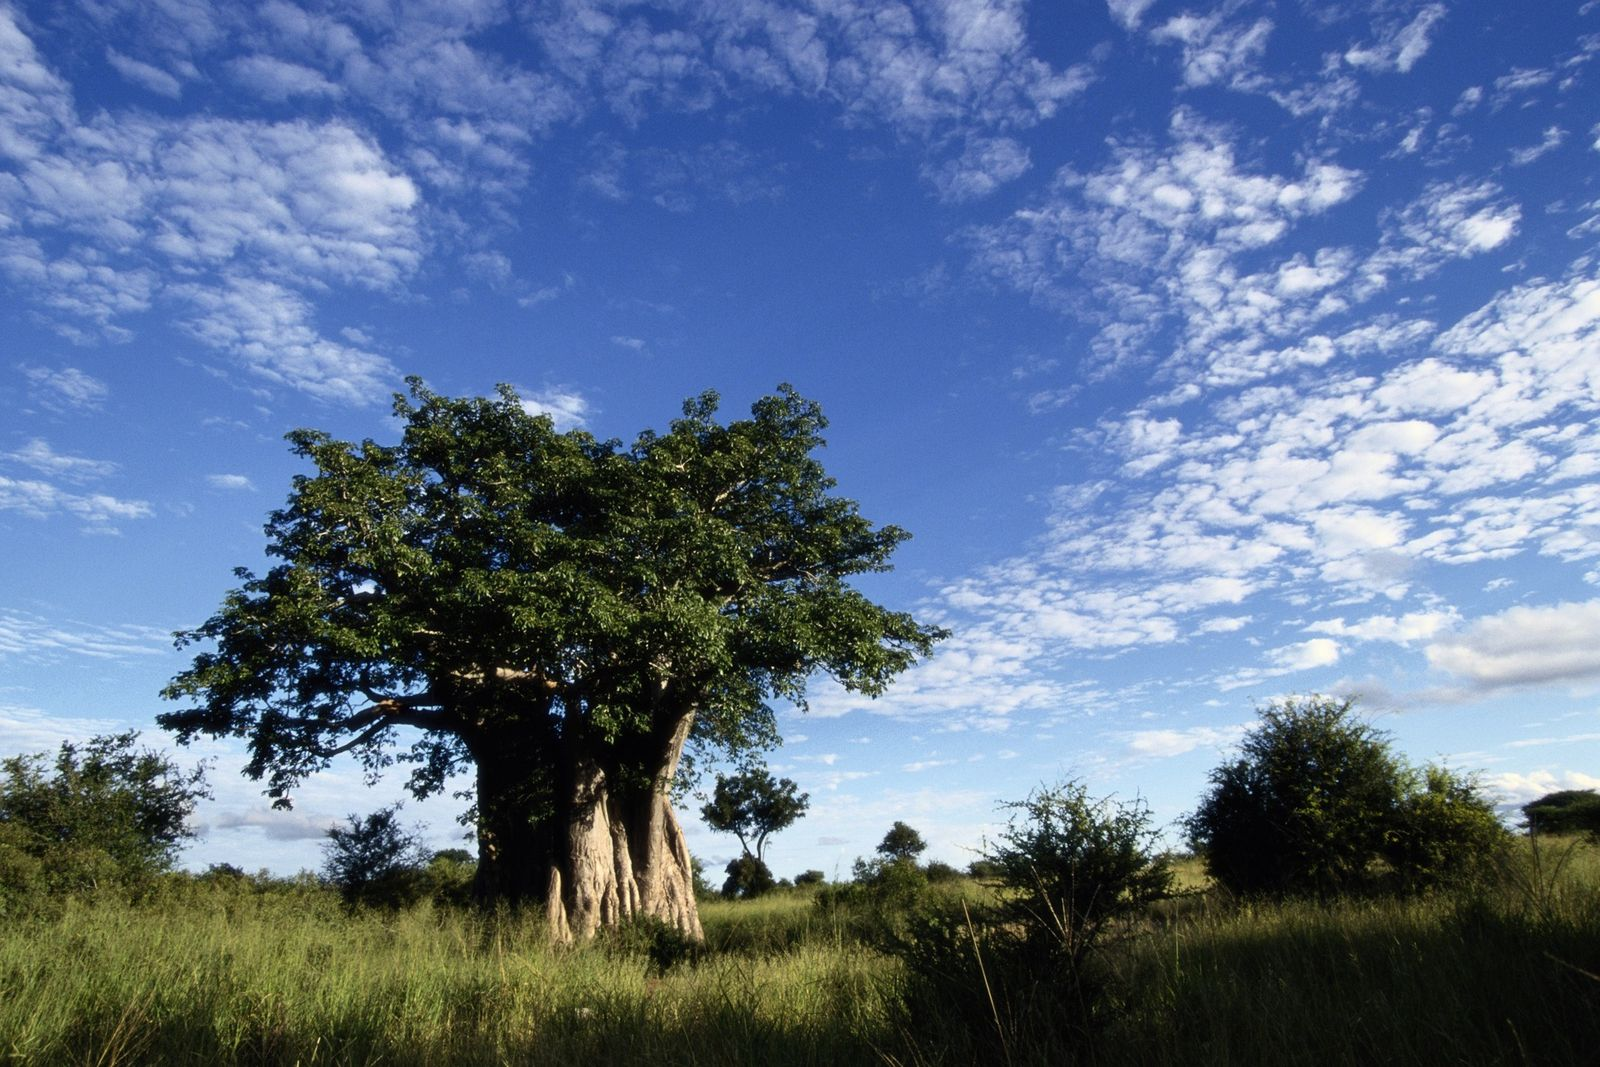 Un enorme baobab